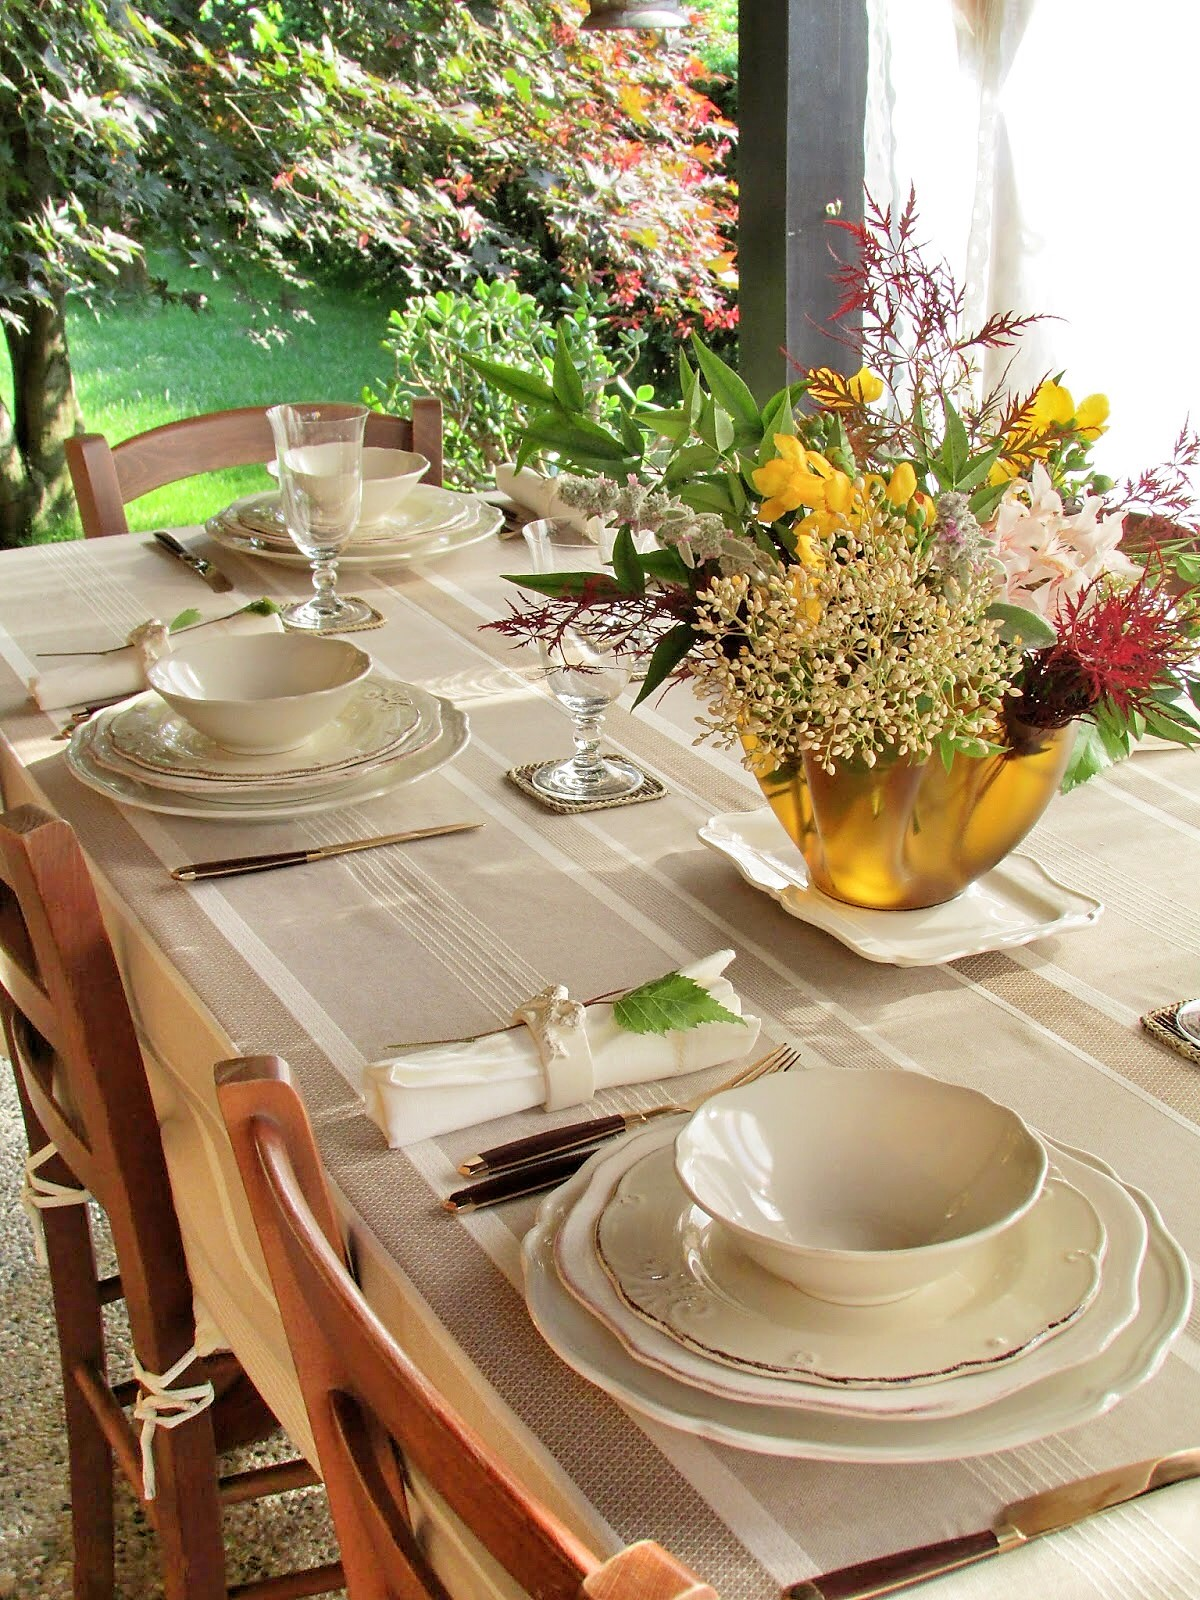 tavola all'aperto